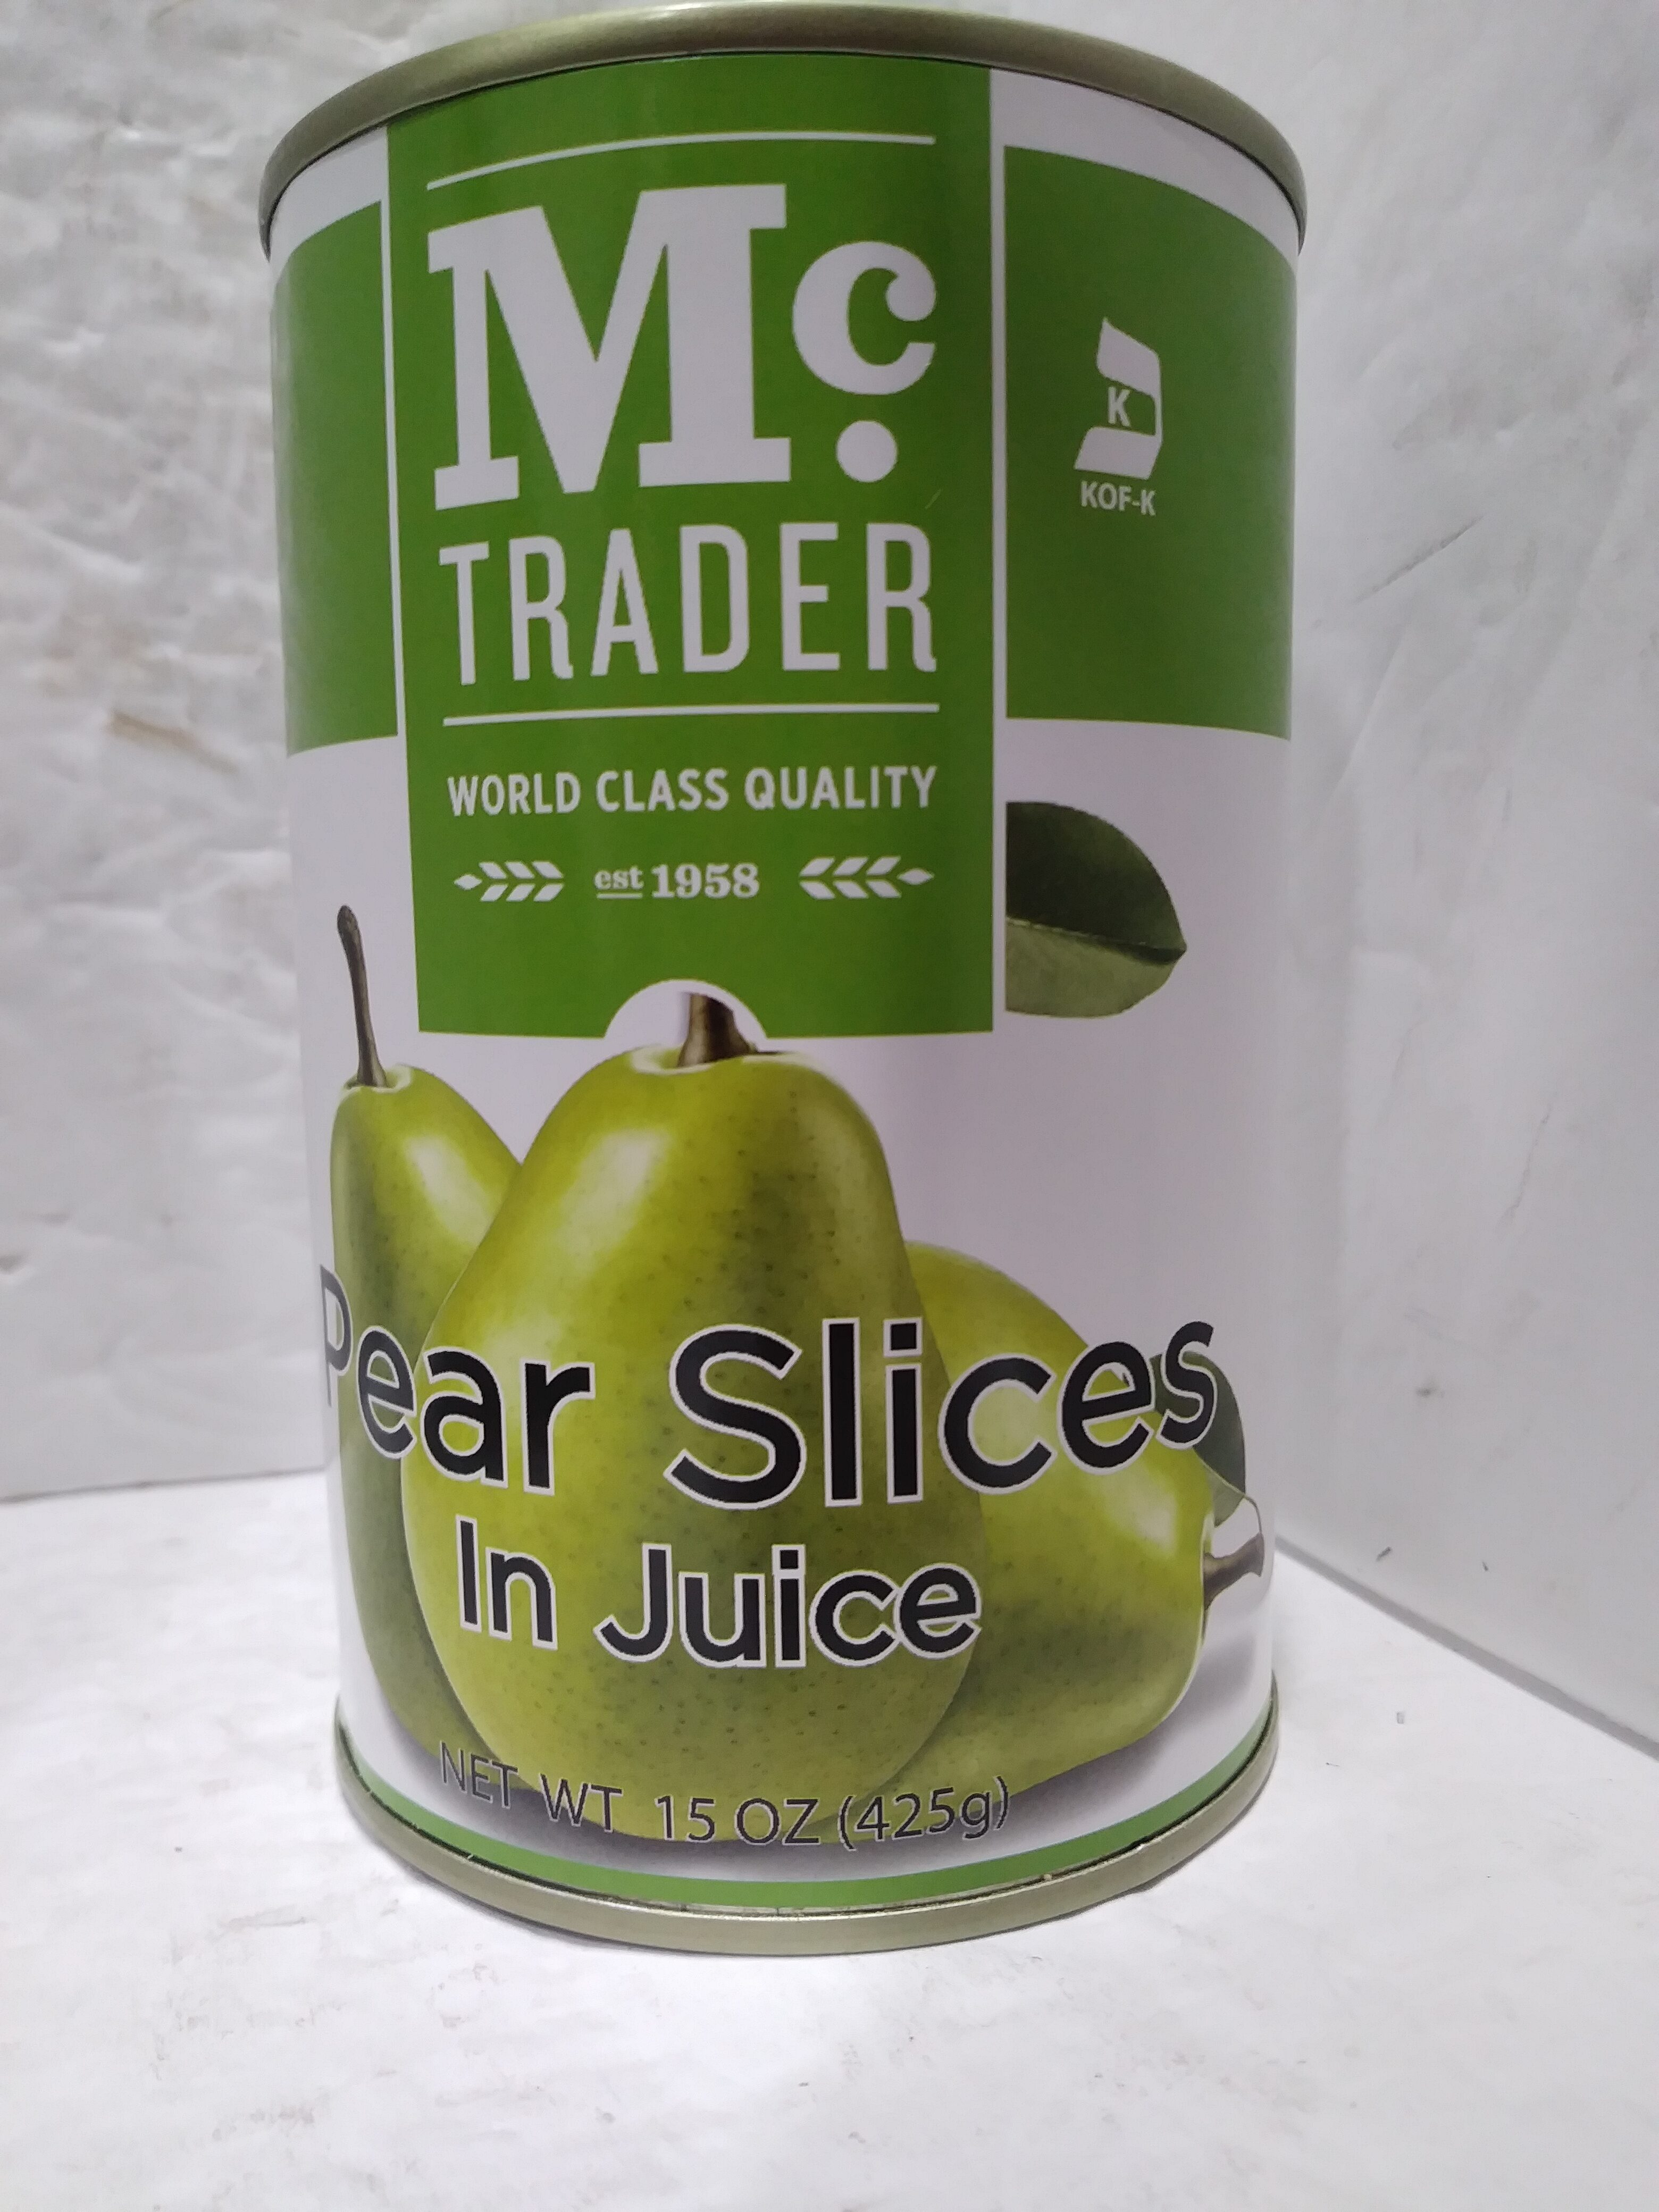 Pear slices in juice - Product - en